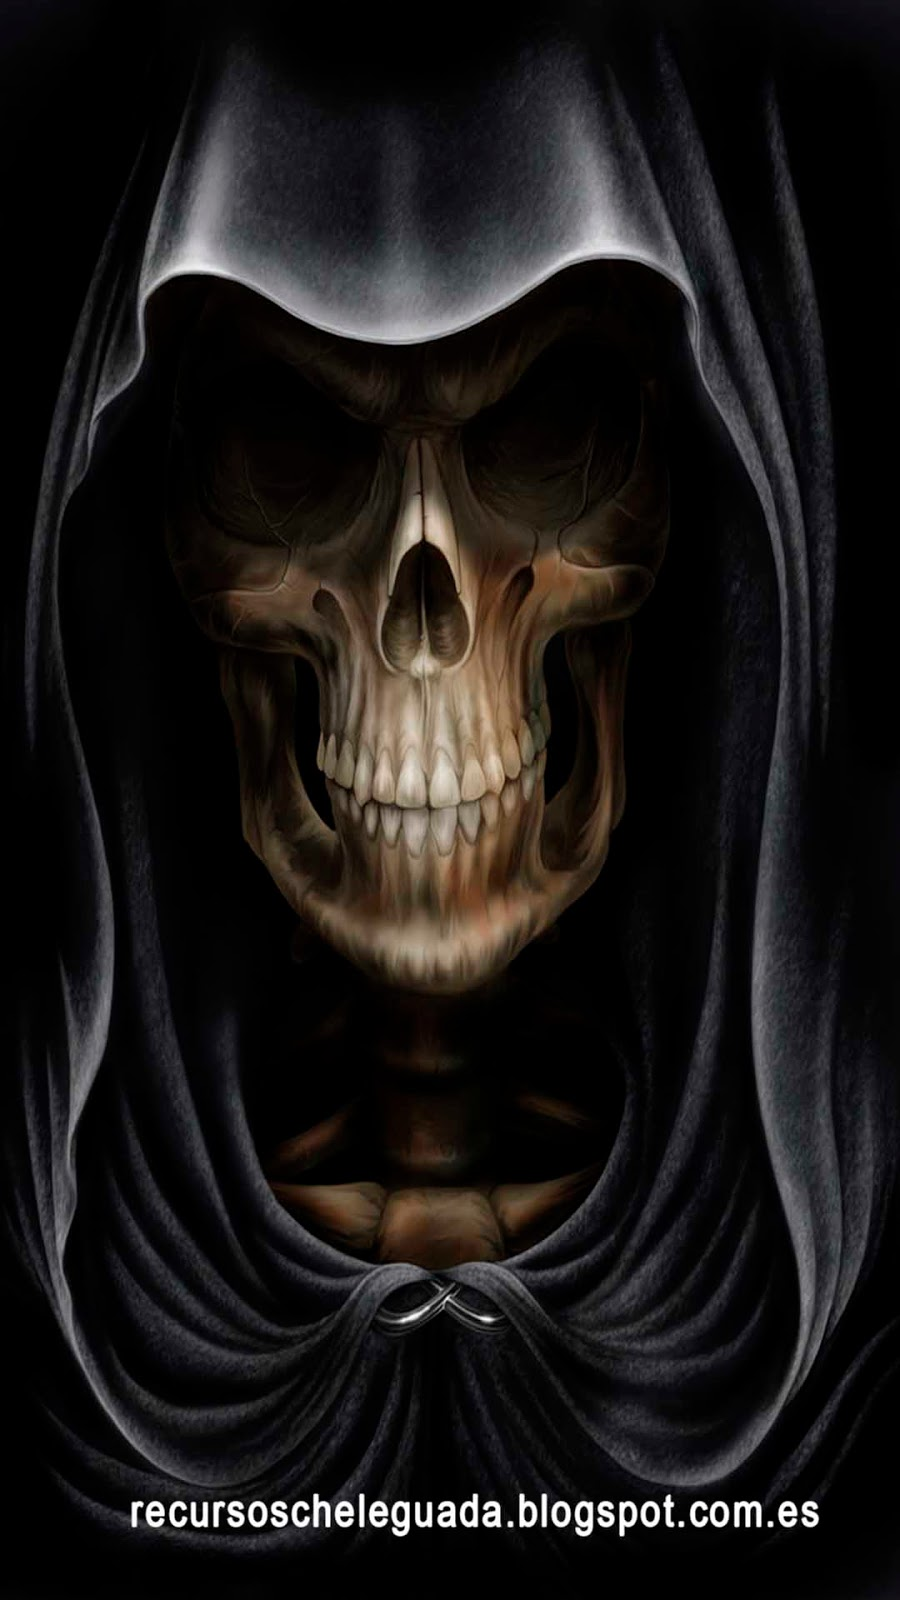 Recursos Chele Guada: Fondos para movil de terror HD nº1